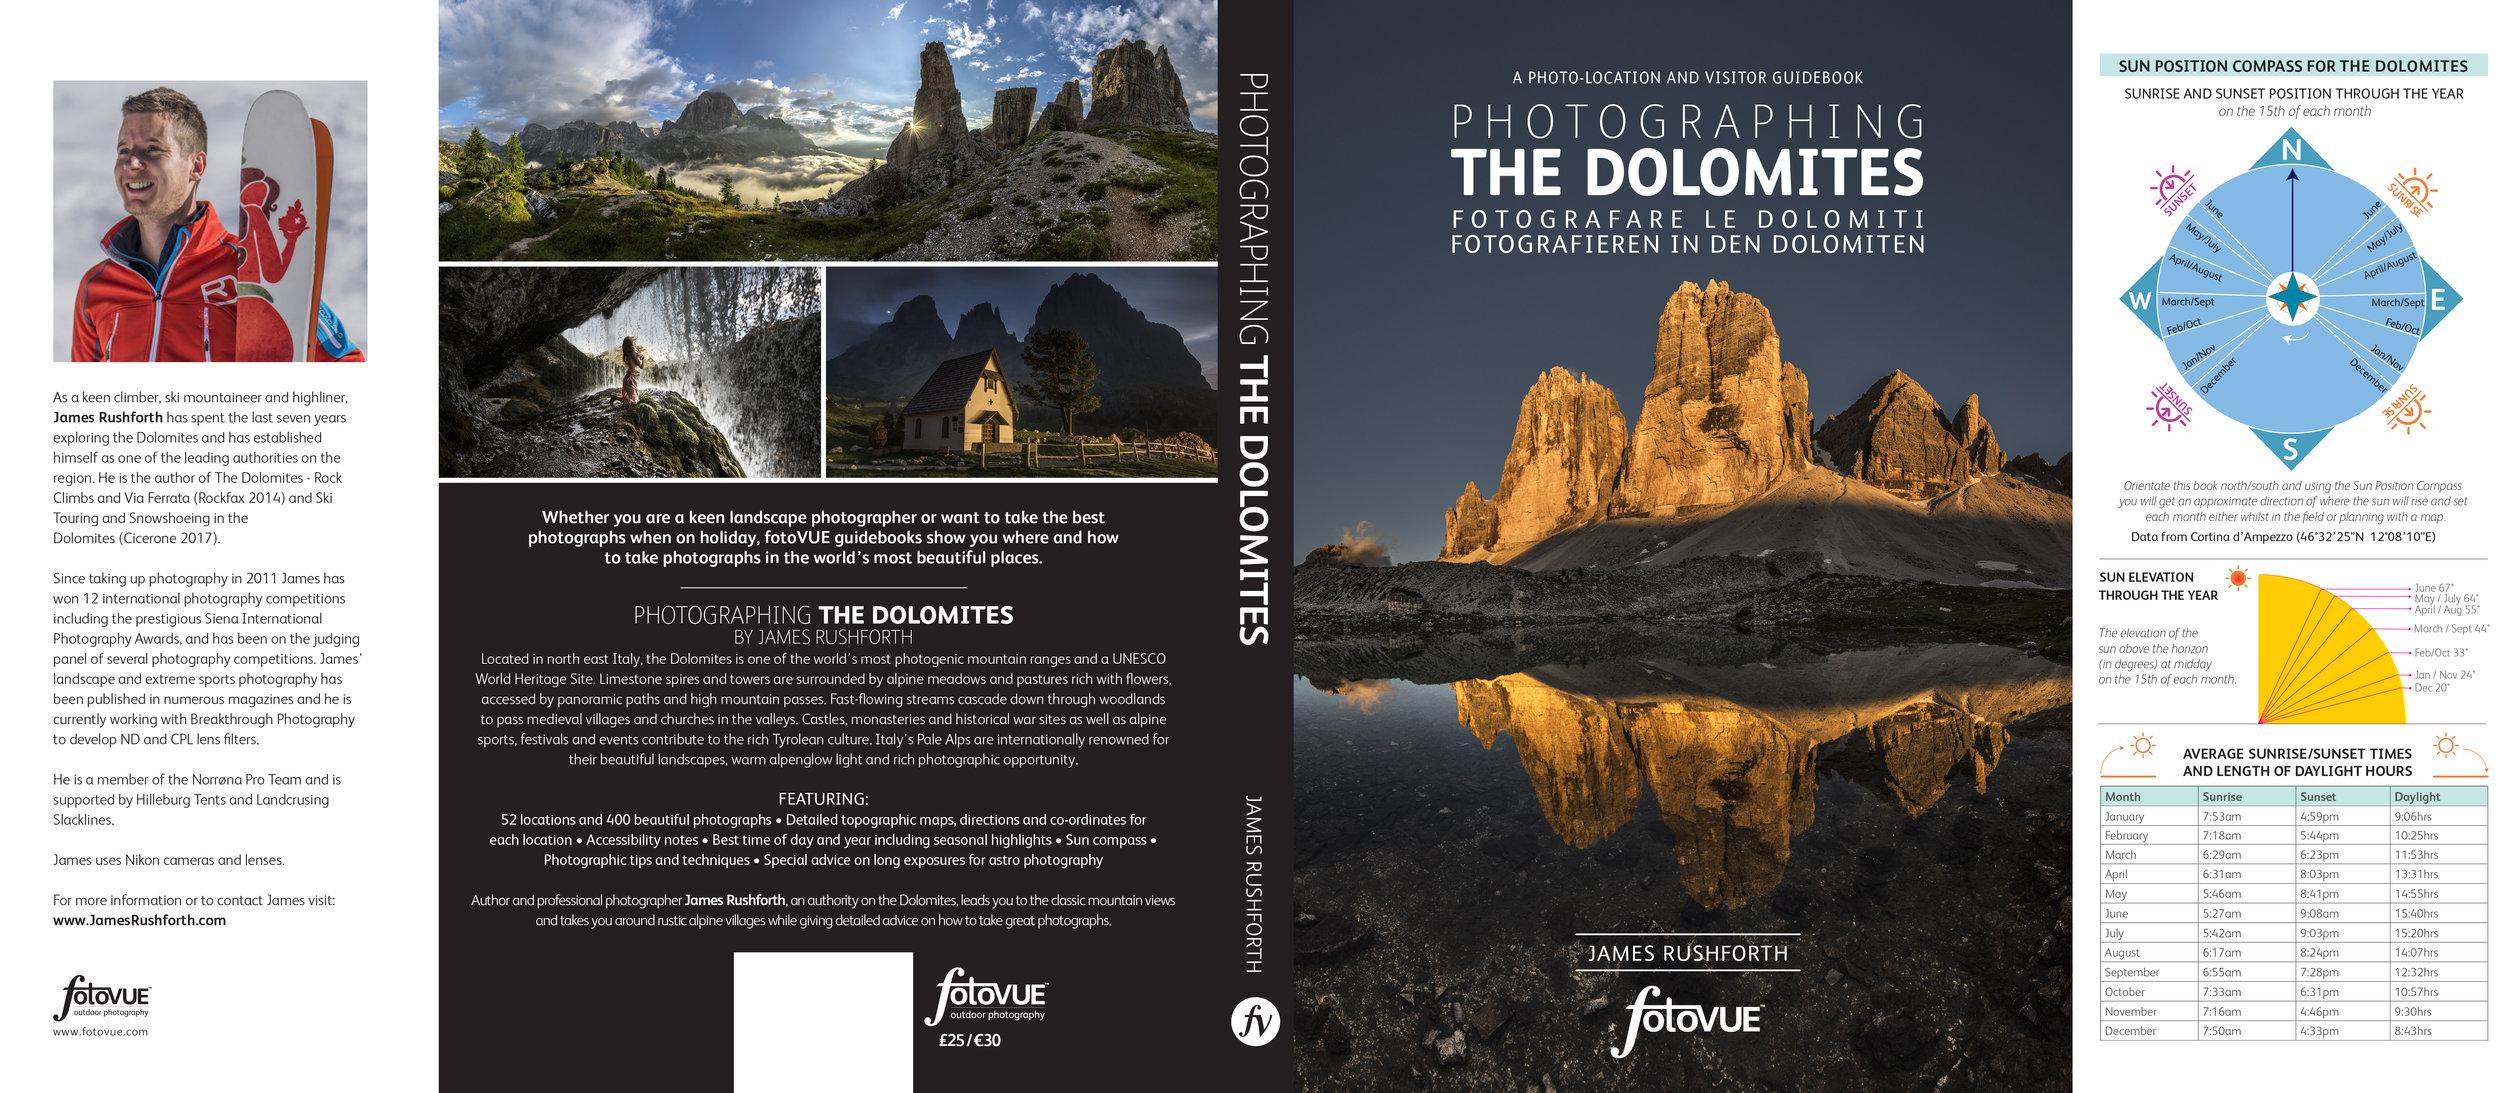 DOLOMITES FULL COVER 9th May 17.jpg